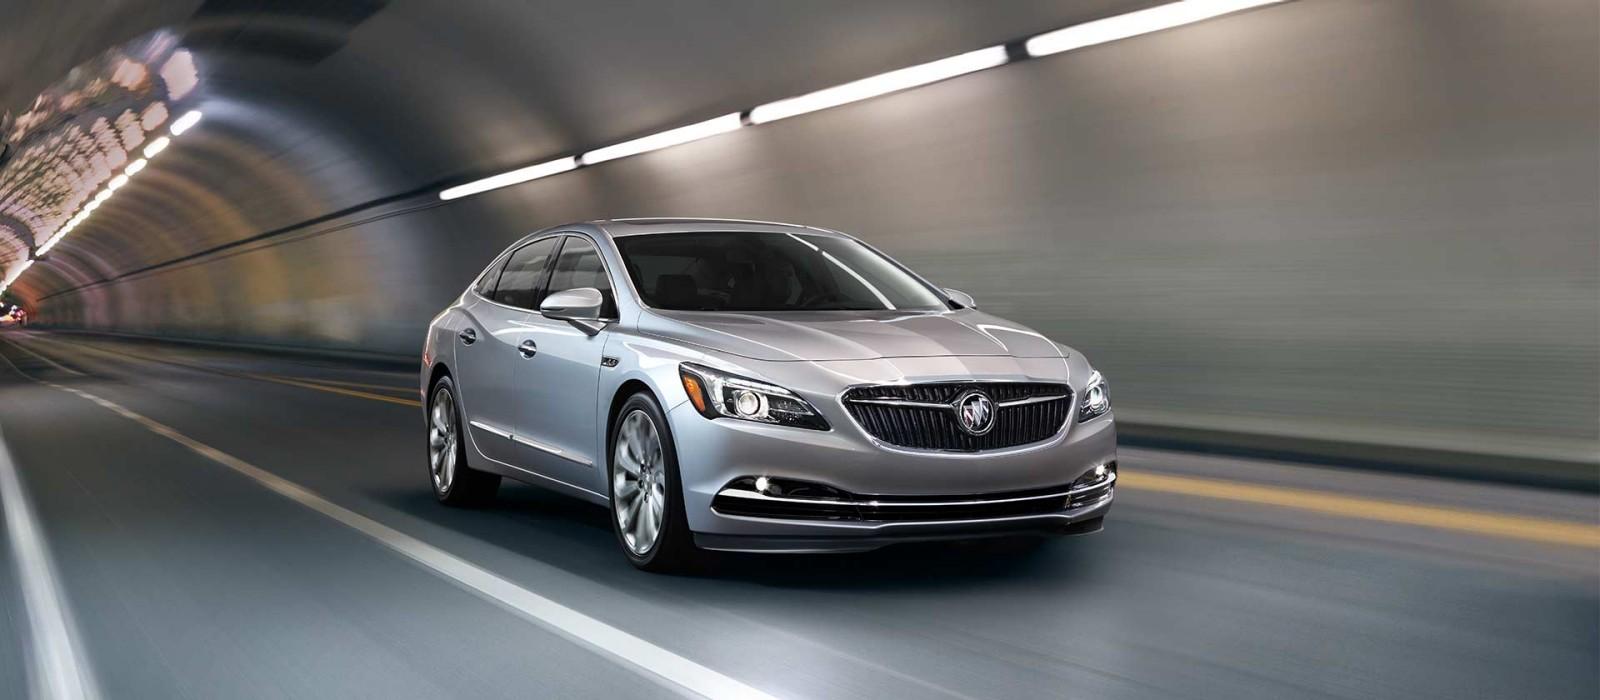 Buick LaCrosse: Roadside Assistance Program (U.S. and Canada)